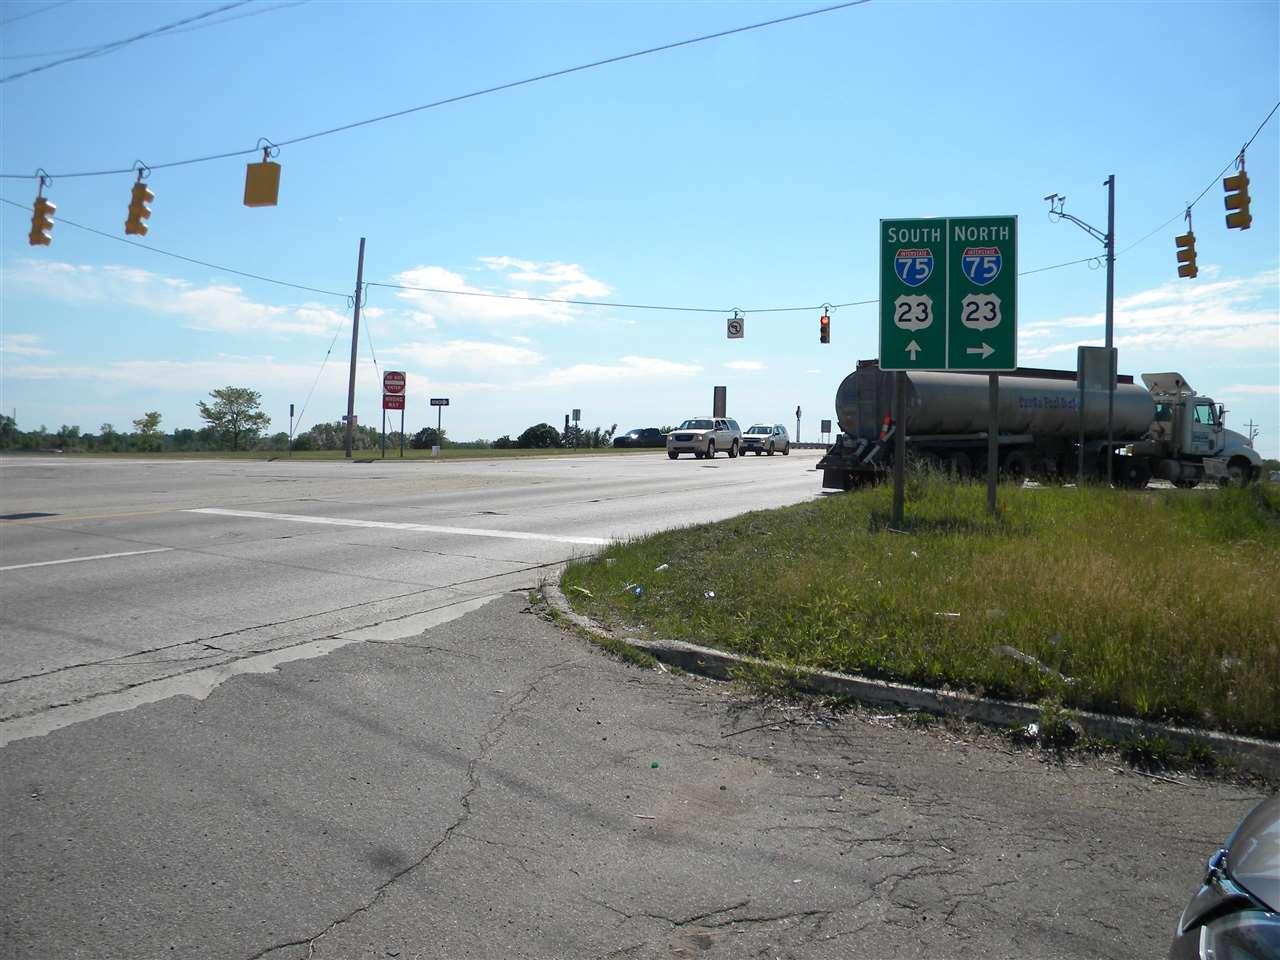 4184 Pierson rd, Flint, MI 48504